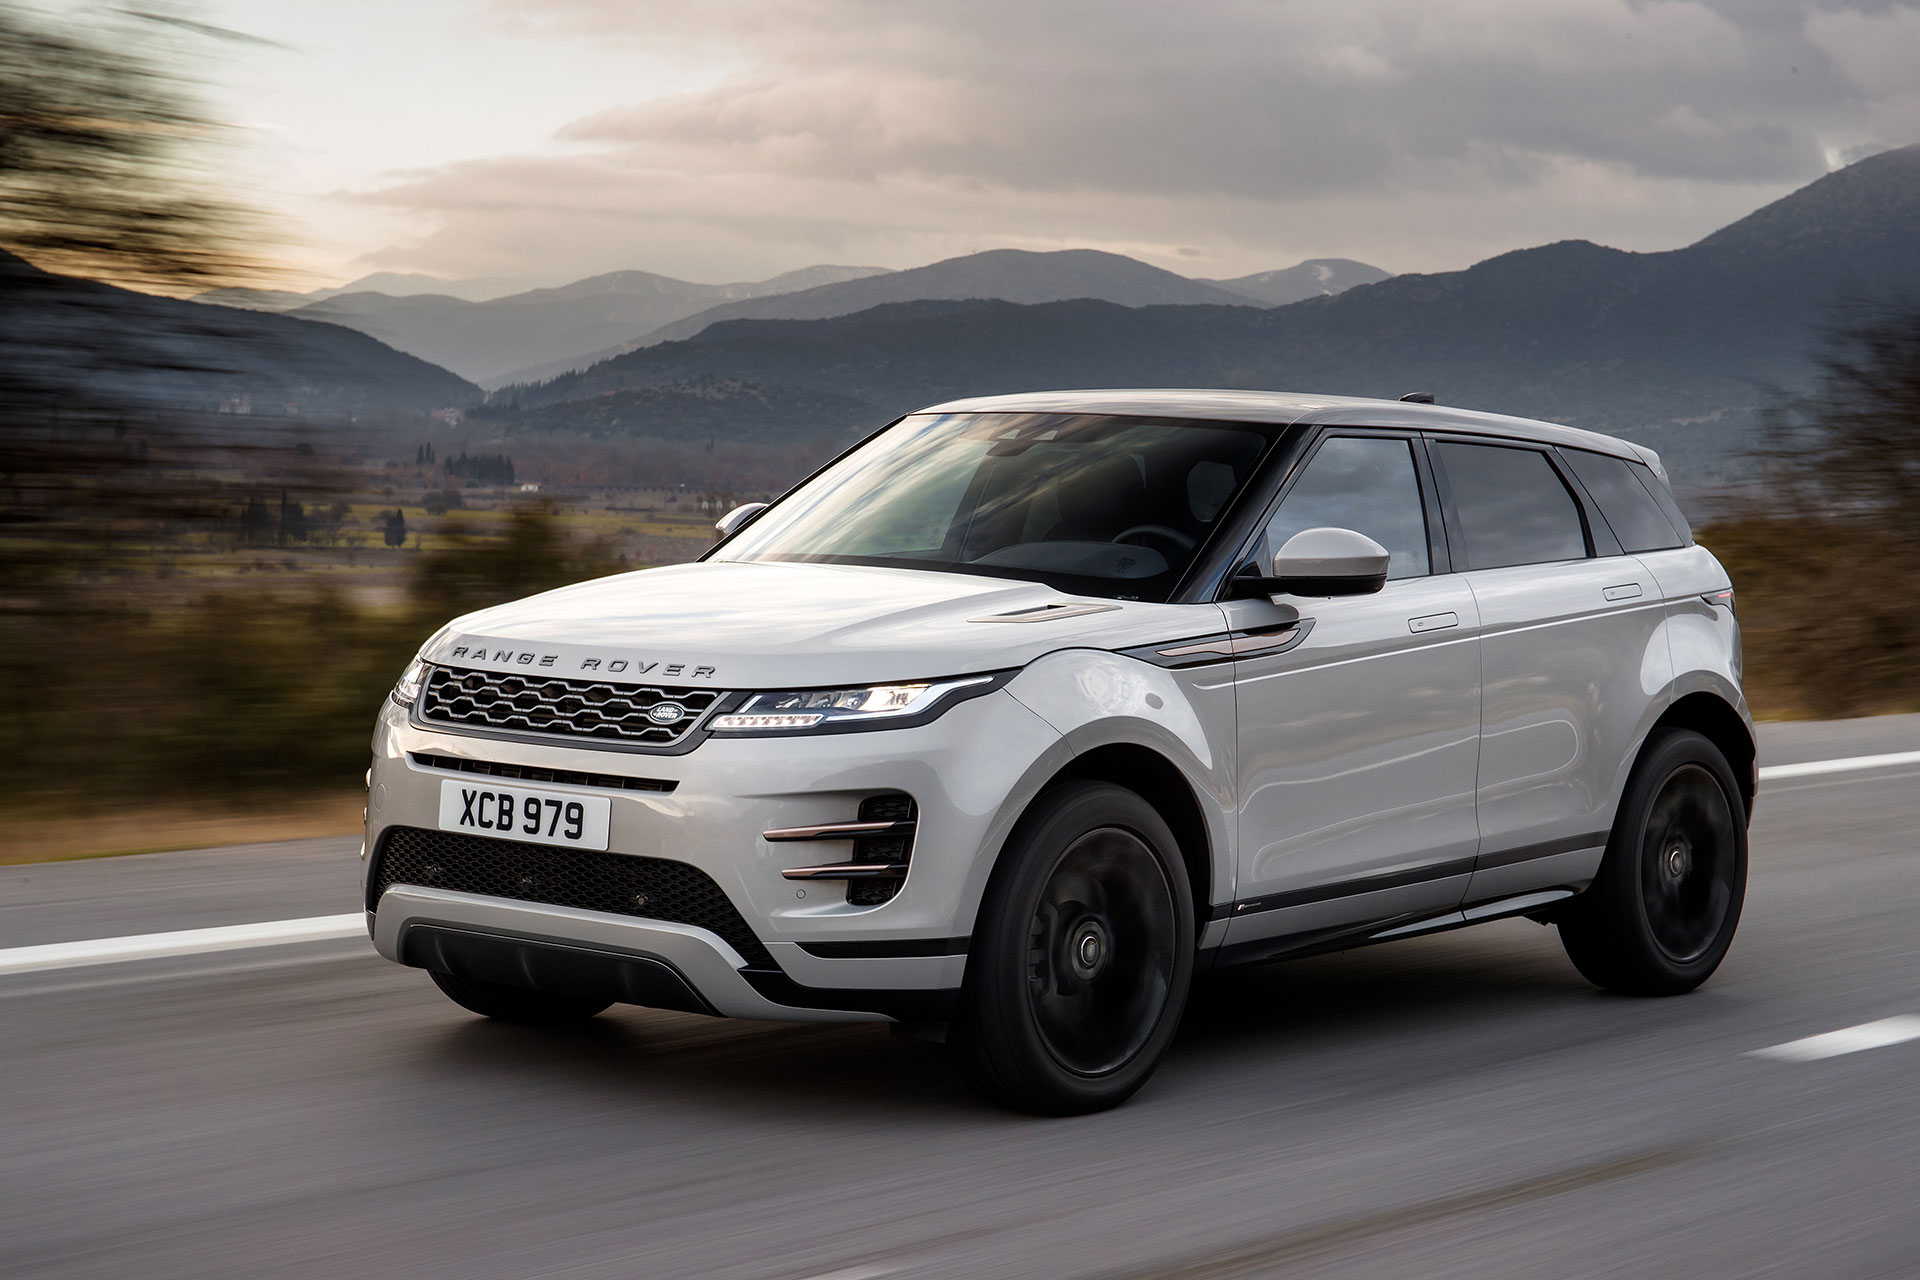 Range Rover Evoque 2019 Gris Movimiento 16